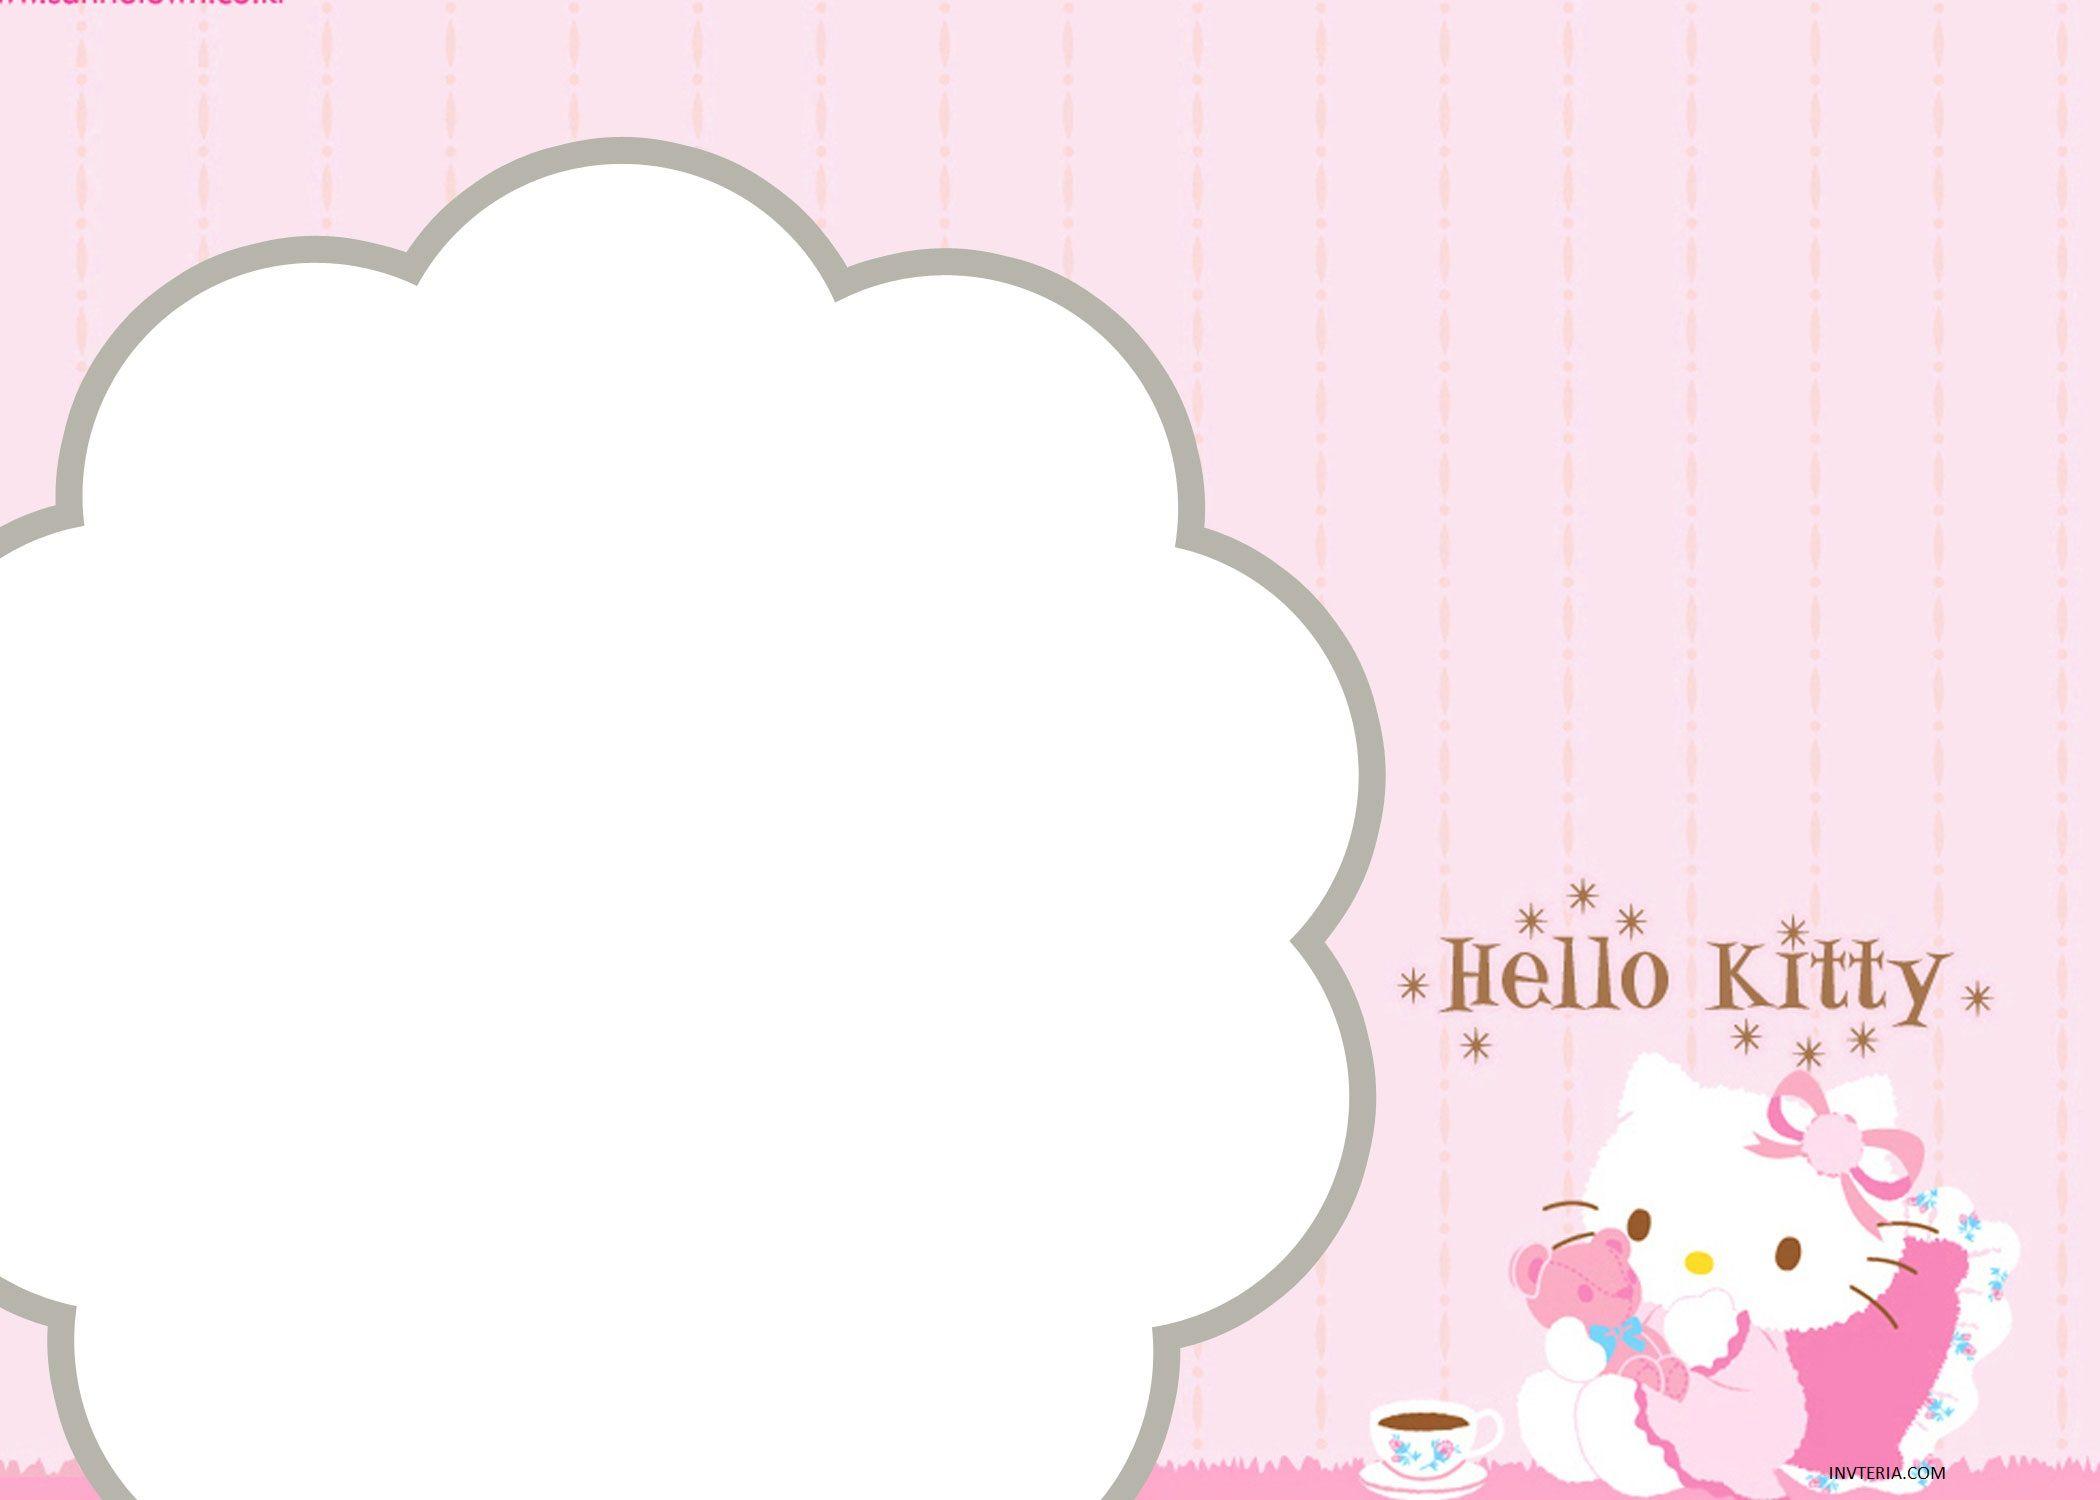 FINE FREE HELLO KITTY BIRTHDAY INVITATIONS EDITABLE